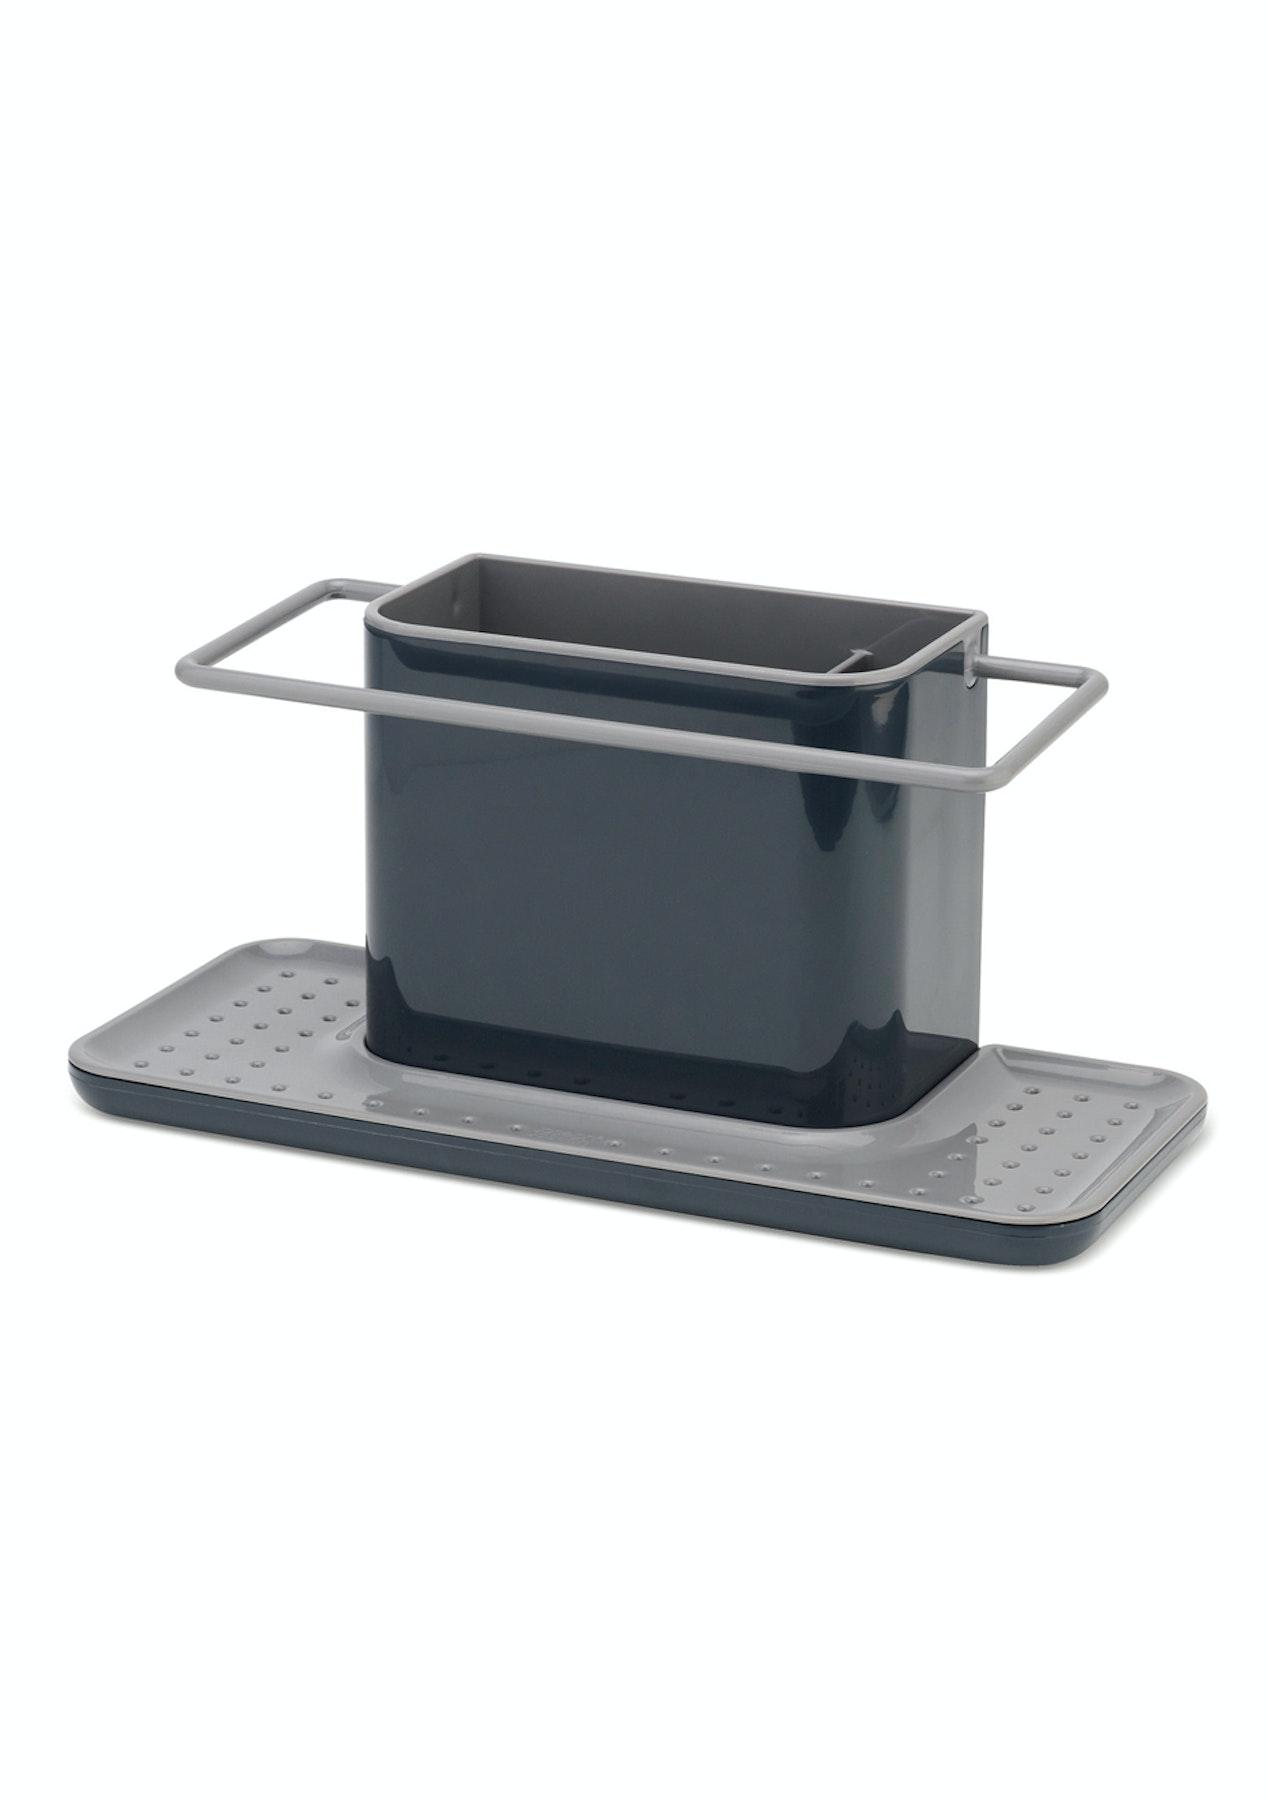 Joseph joseph sink caddy kitchen sink organizer joseph joseph homeware encore onceit